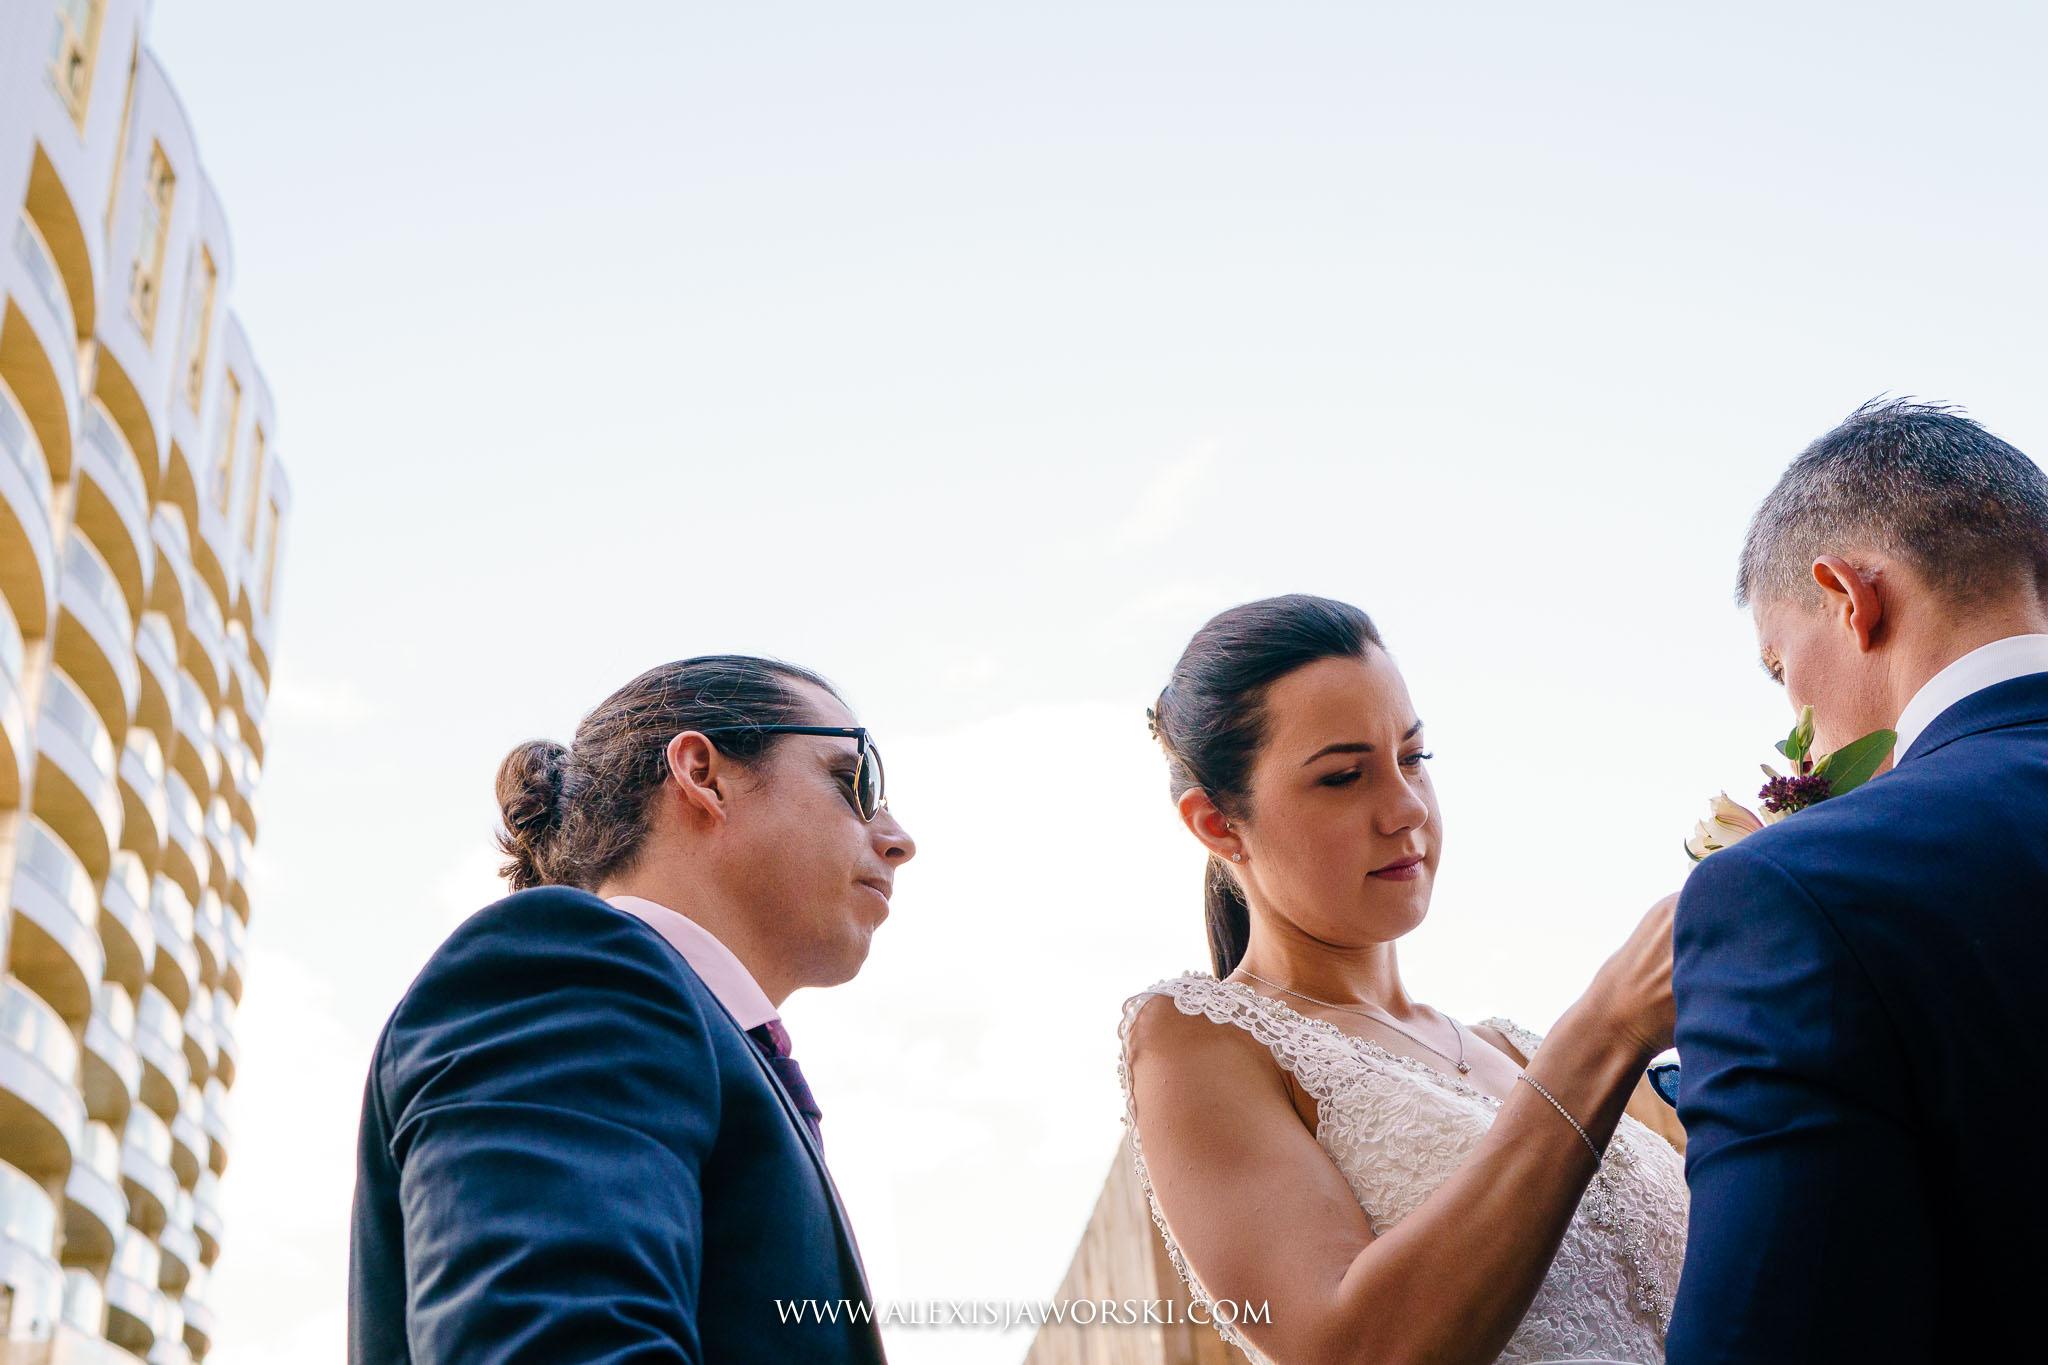 bride helping groom with flower